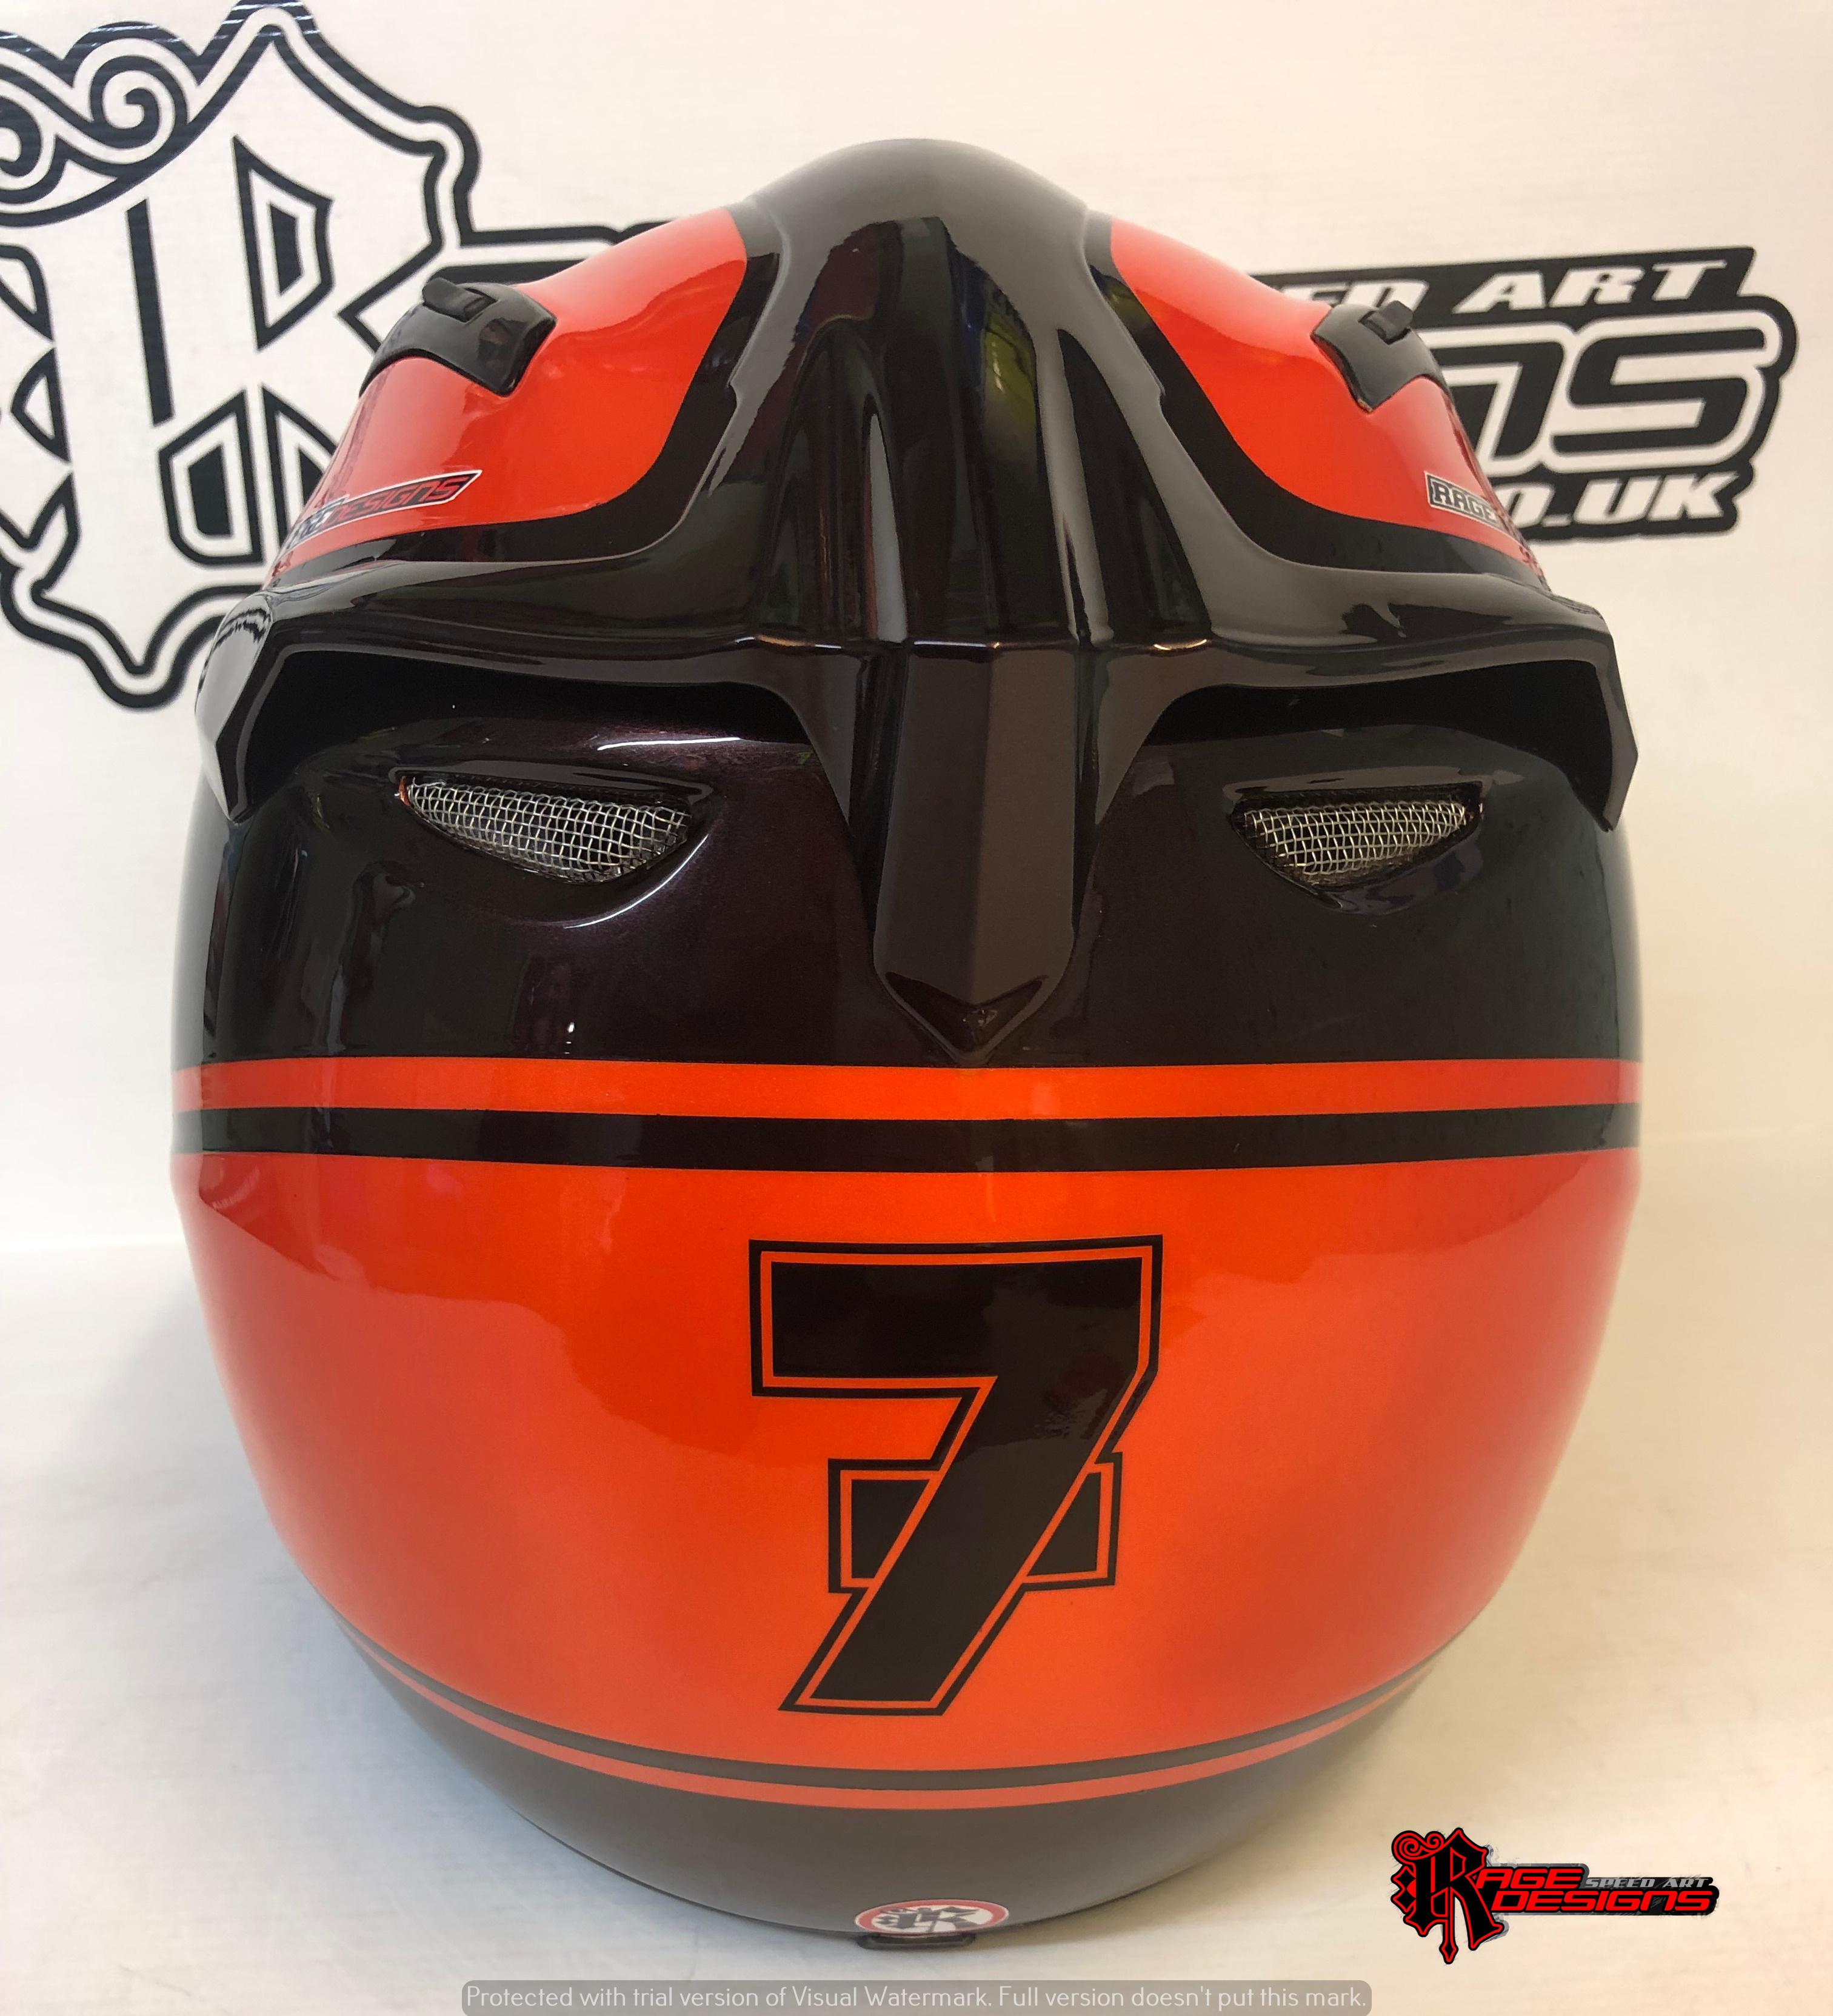 Z900RS Custom Design by Rage Designs